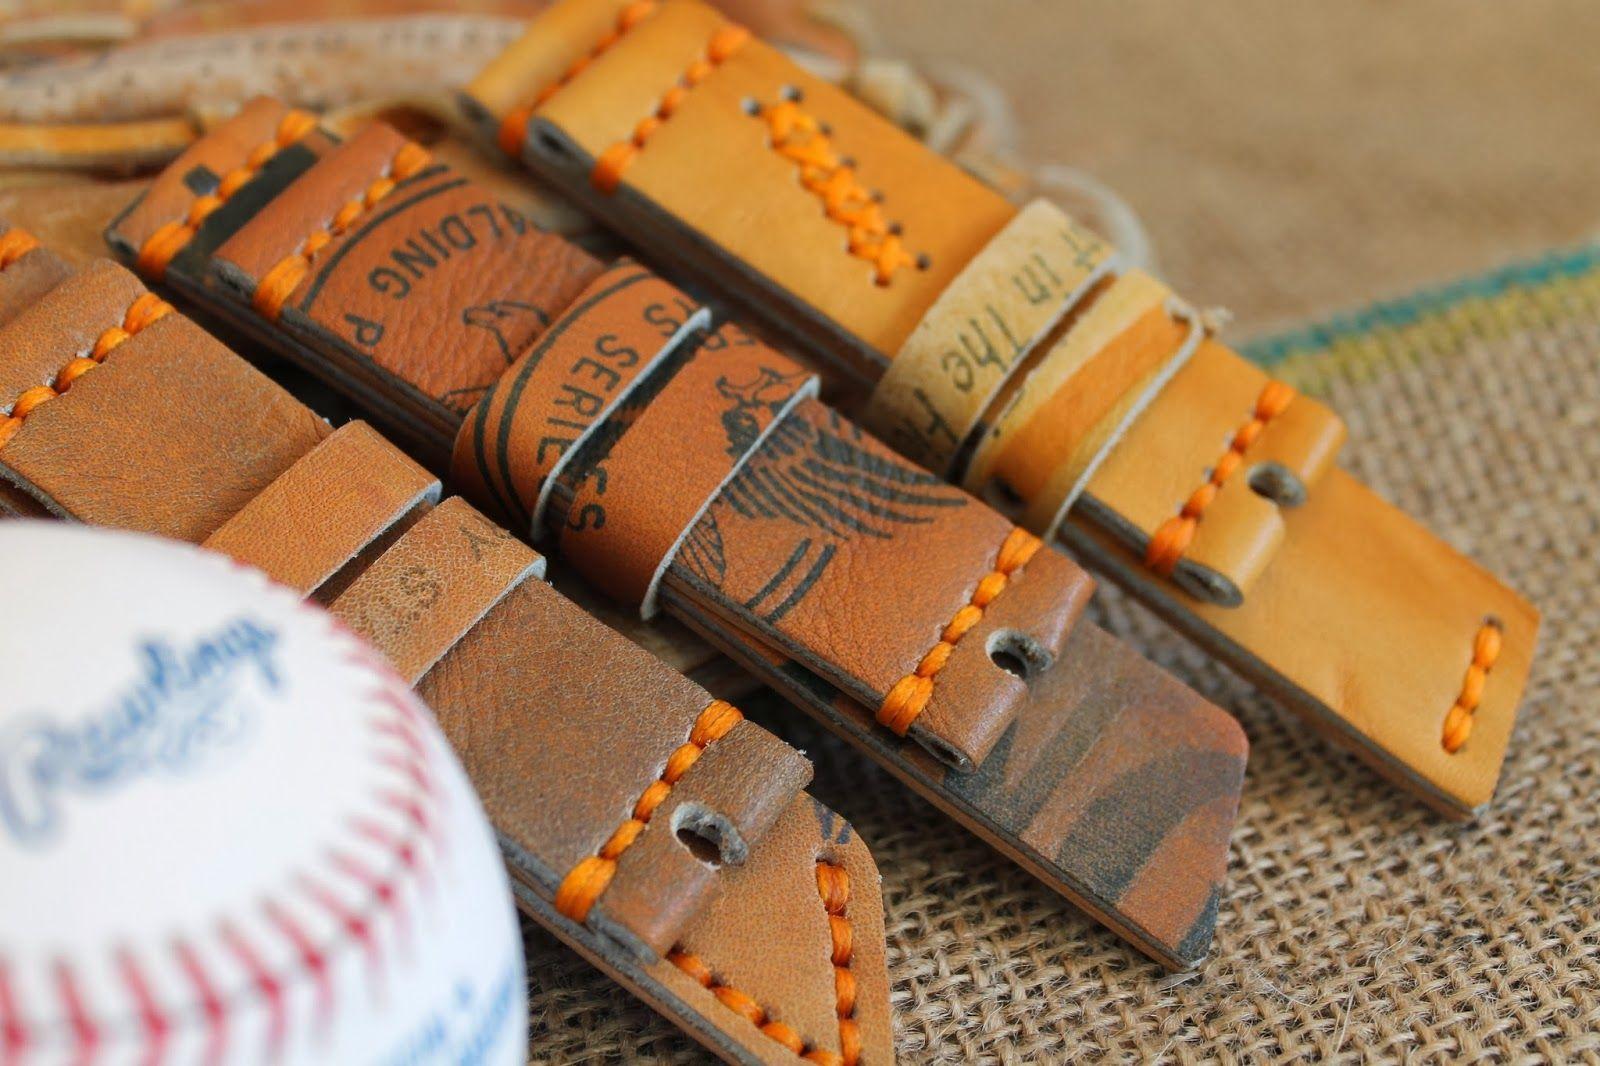 Andy Heymann Baseball Glove Leather Watch Straps Watch Strap Leather Watch Strap Leather Gloves